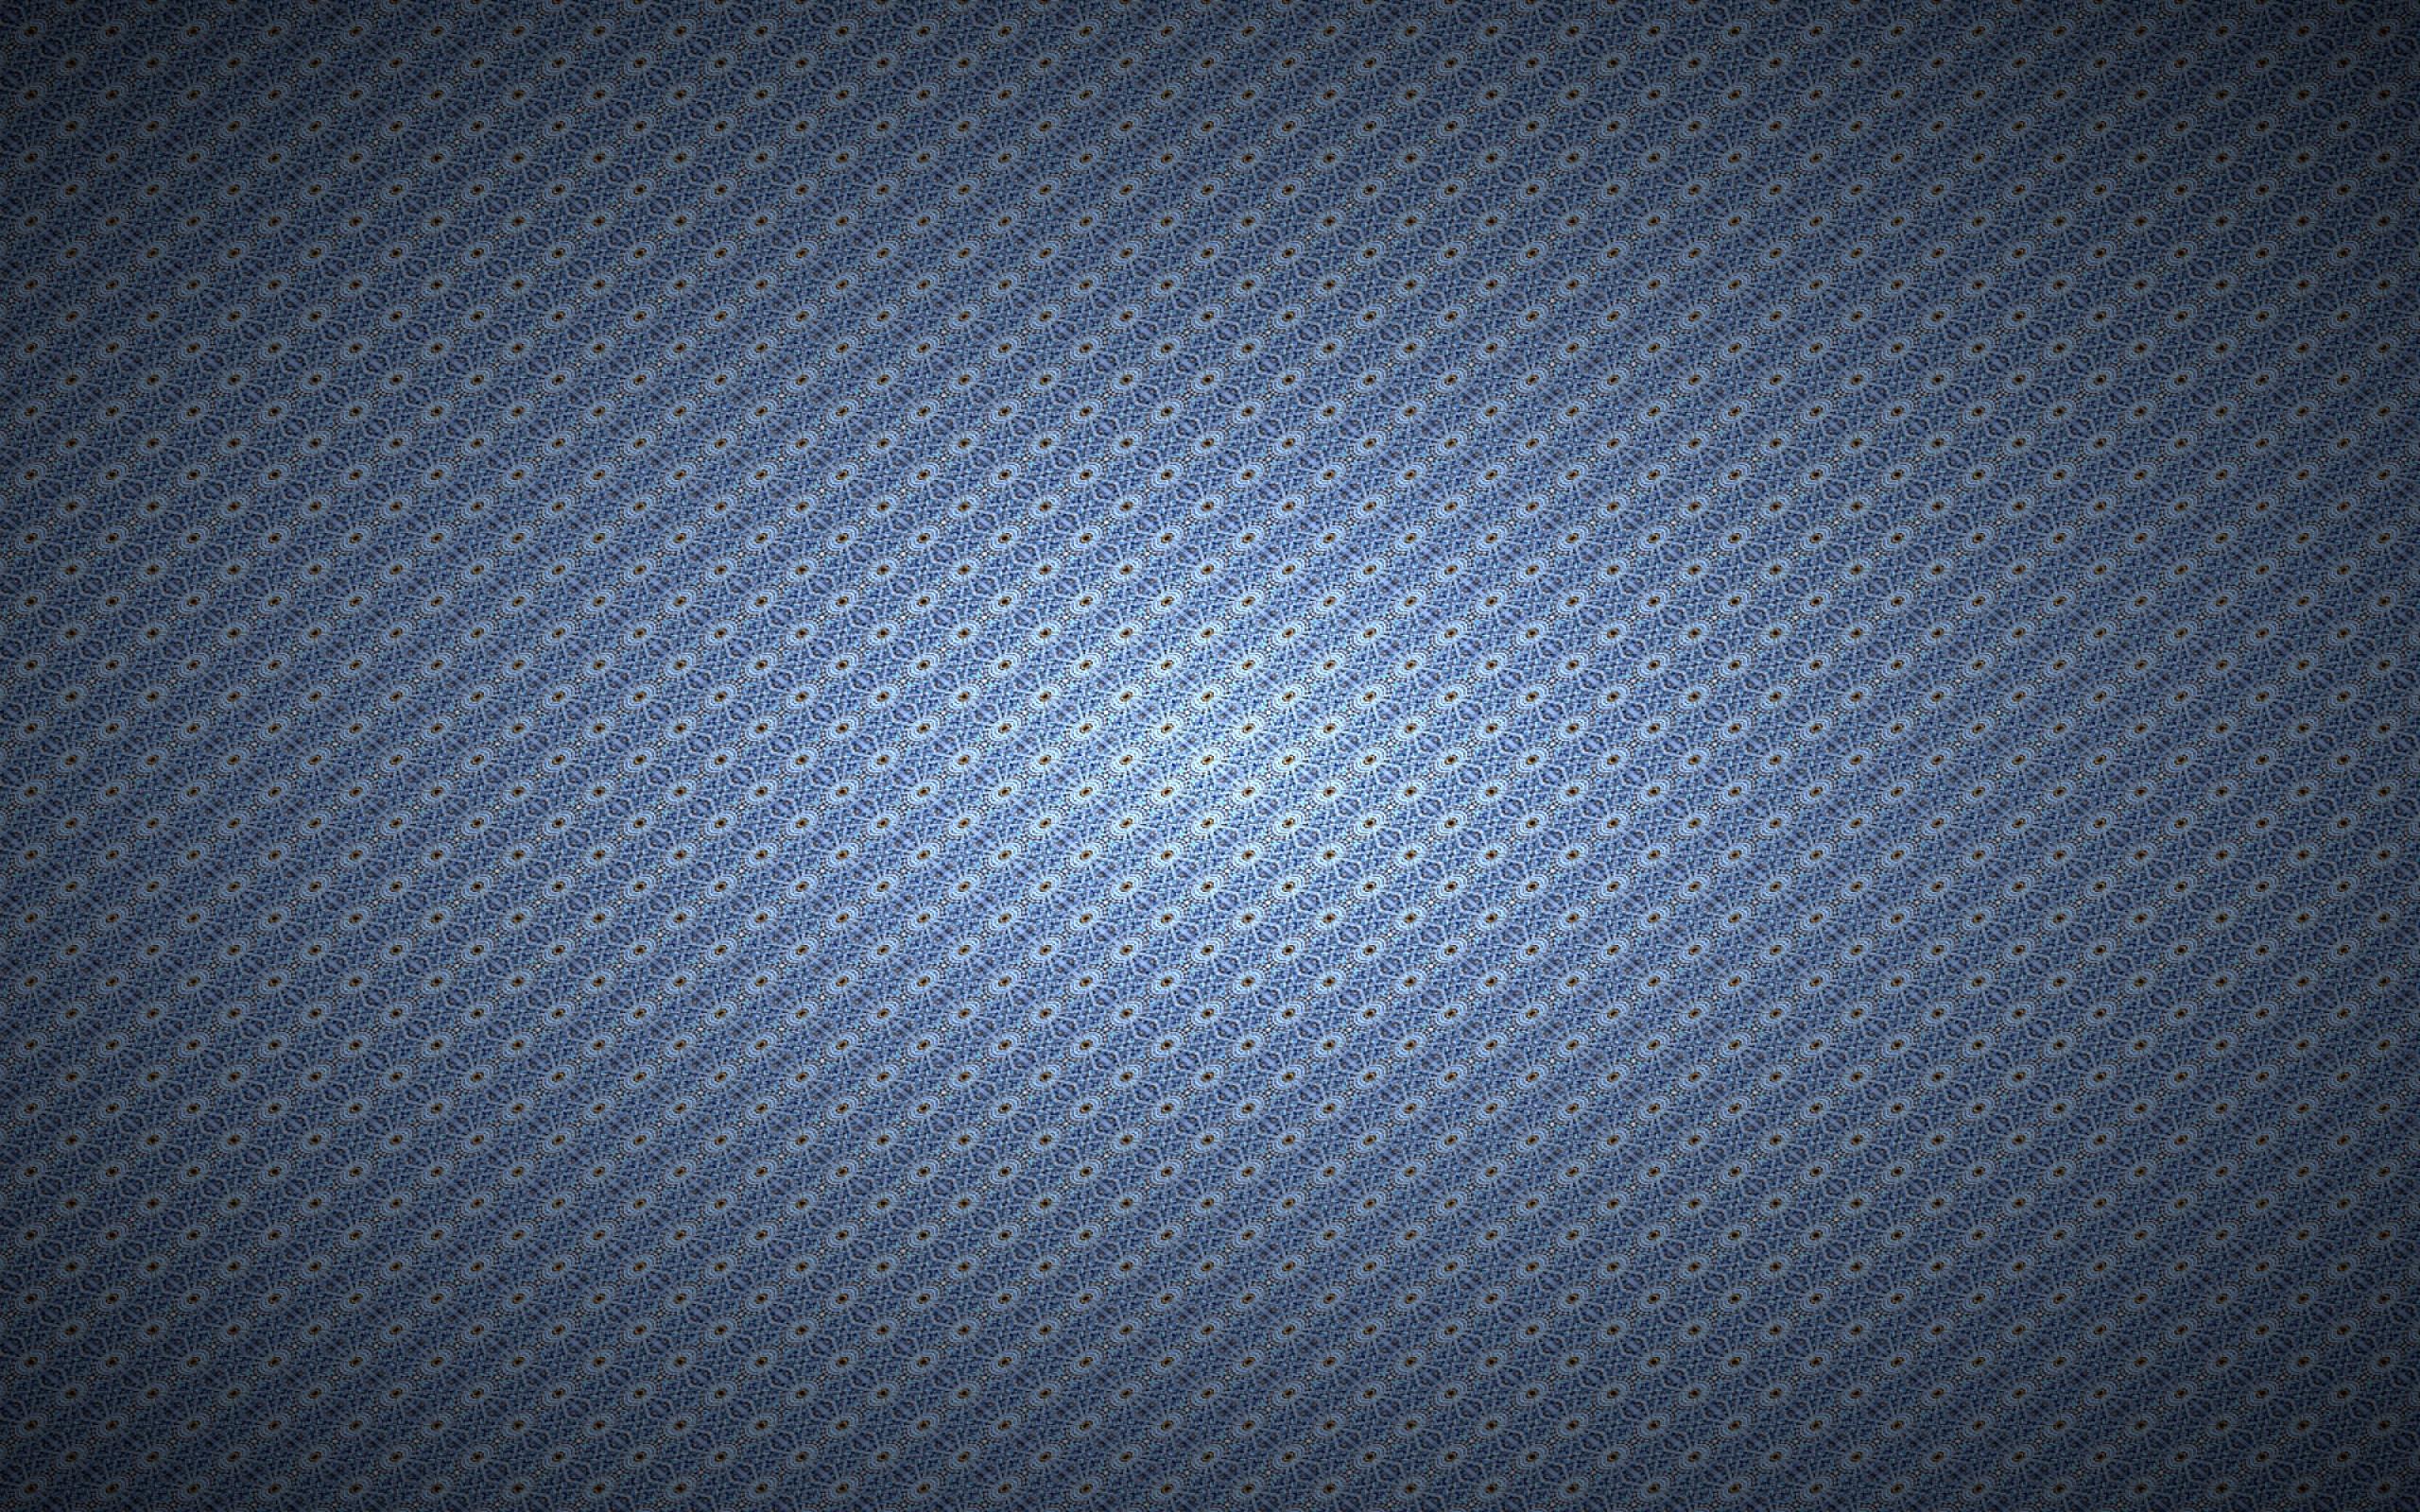 Download Wallpaper 2560x1600 background gray light spot pattern 2560x1600